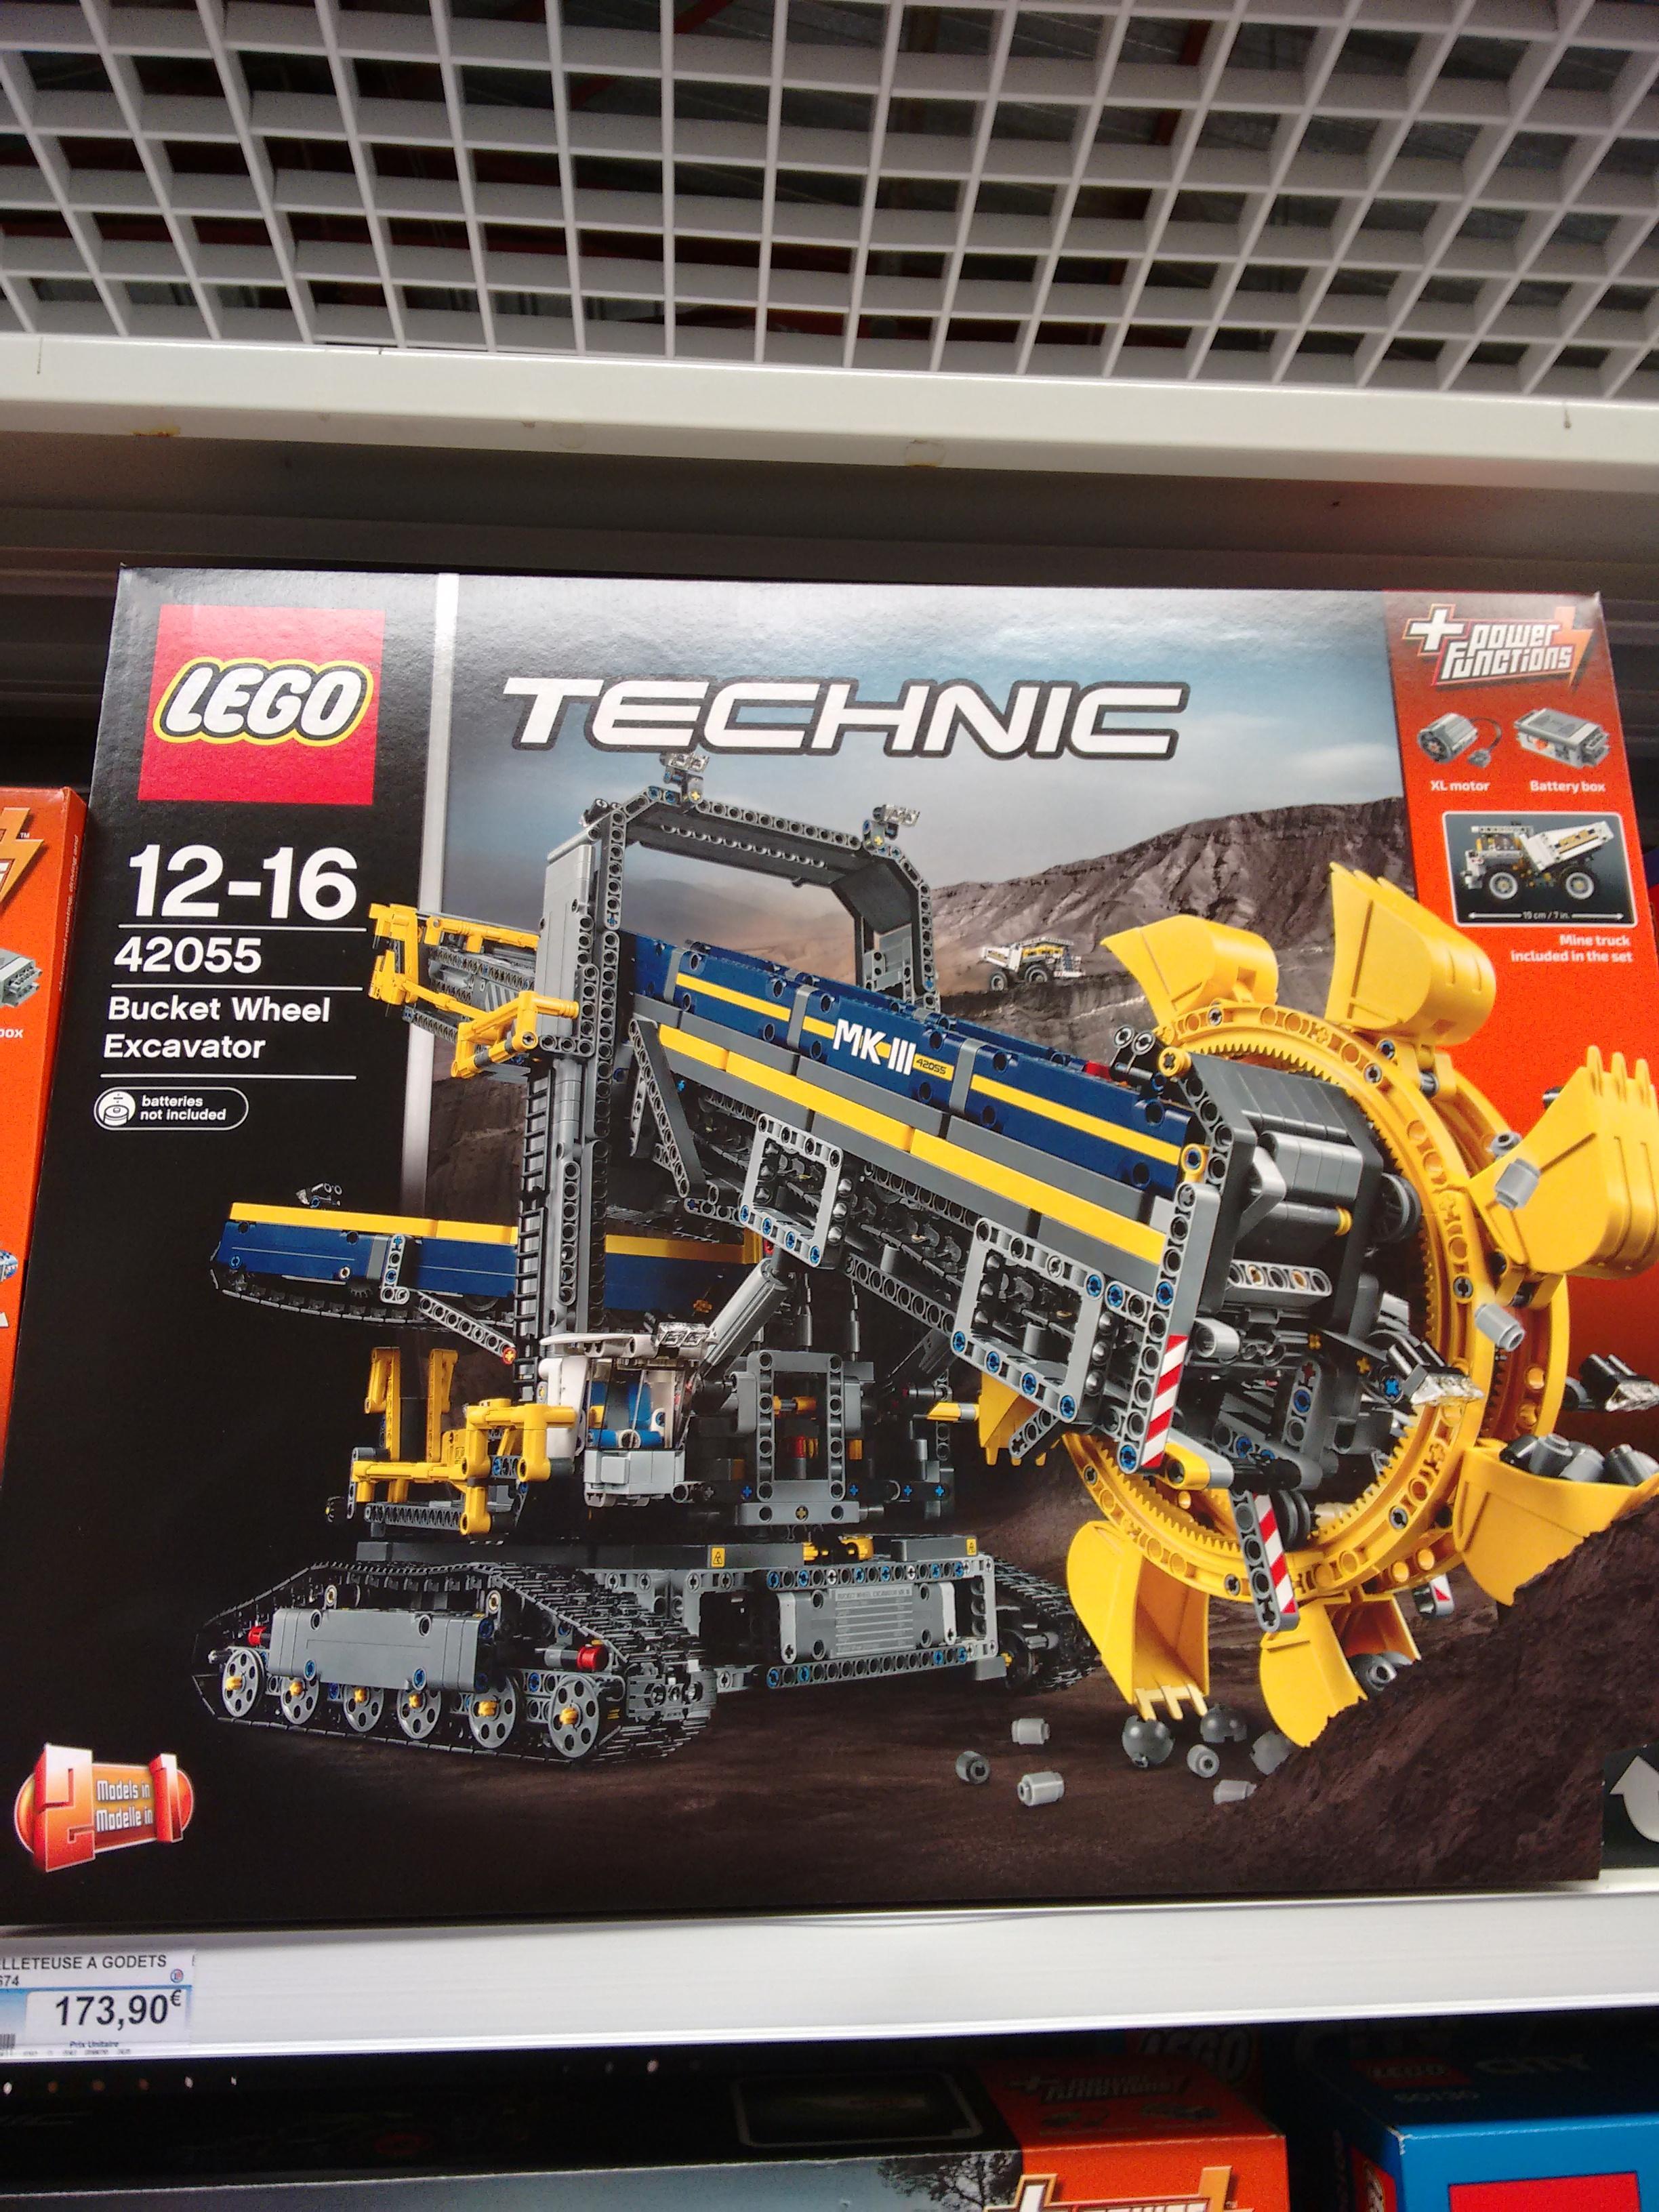 jeu de construction lego technic la pelleteuse godets n 42055. Black Bedroom Furniture Sets. Home Design Ideas